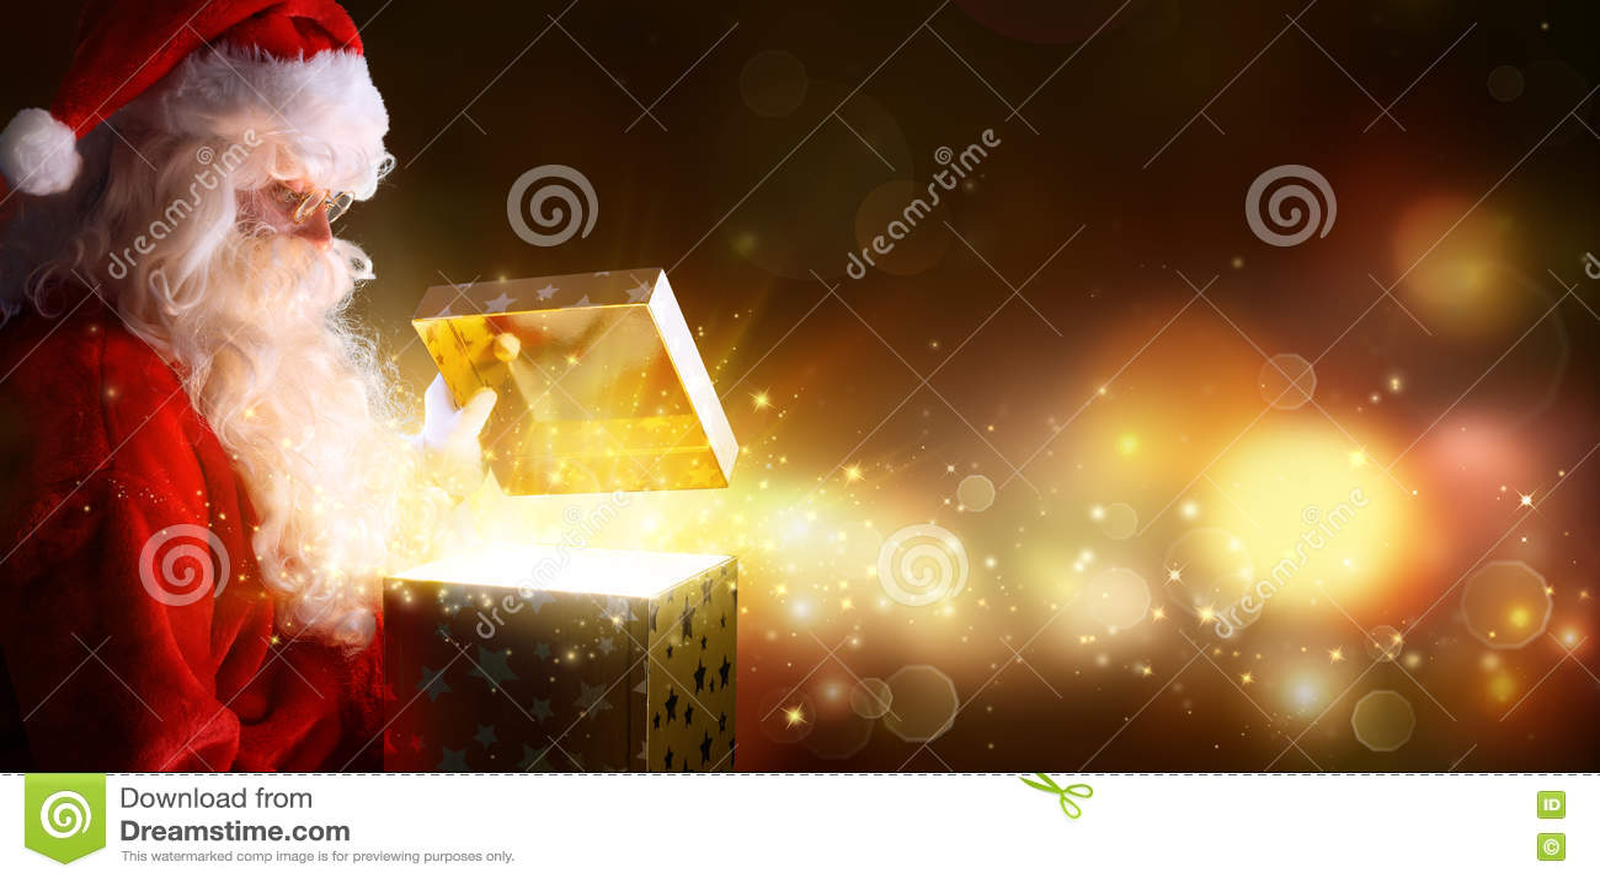 Santa Claus Opening Christmas Present